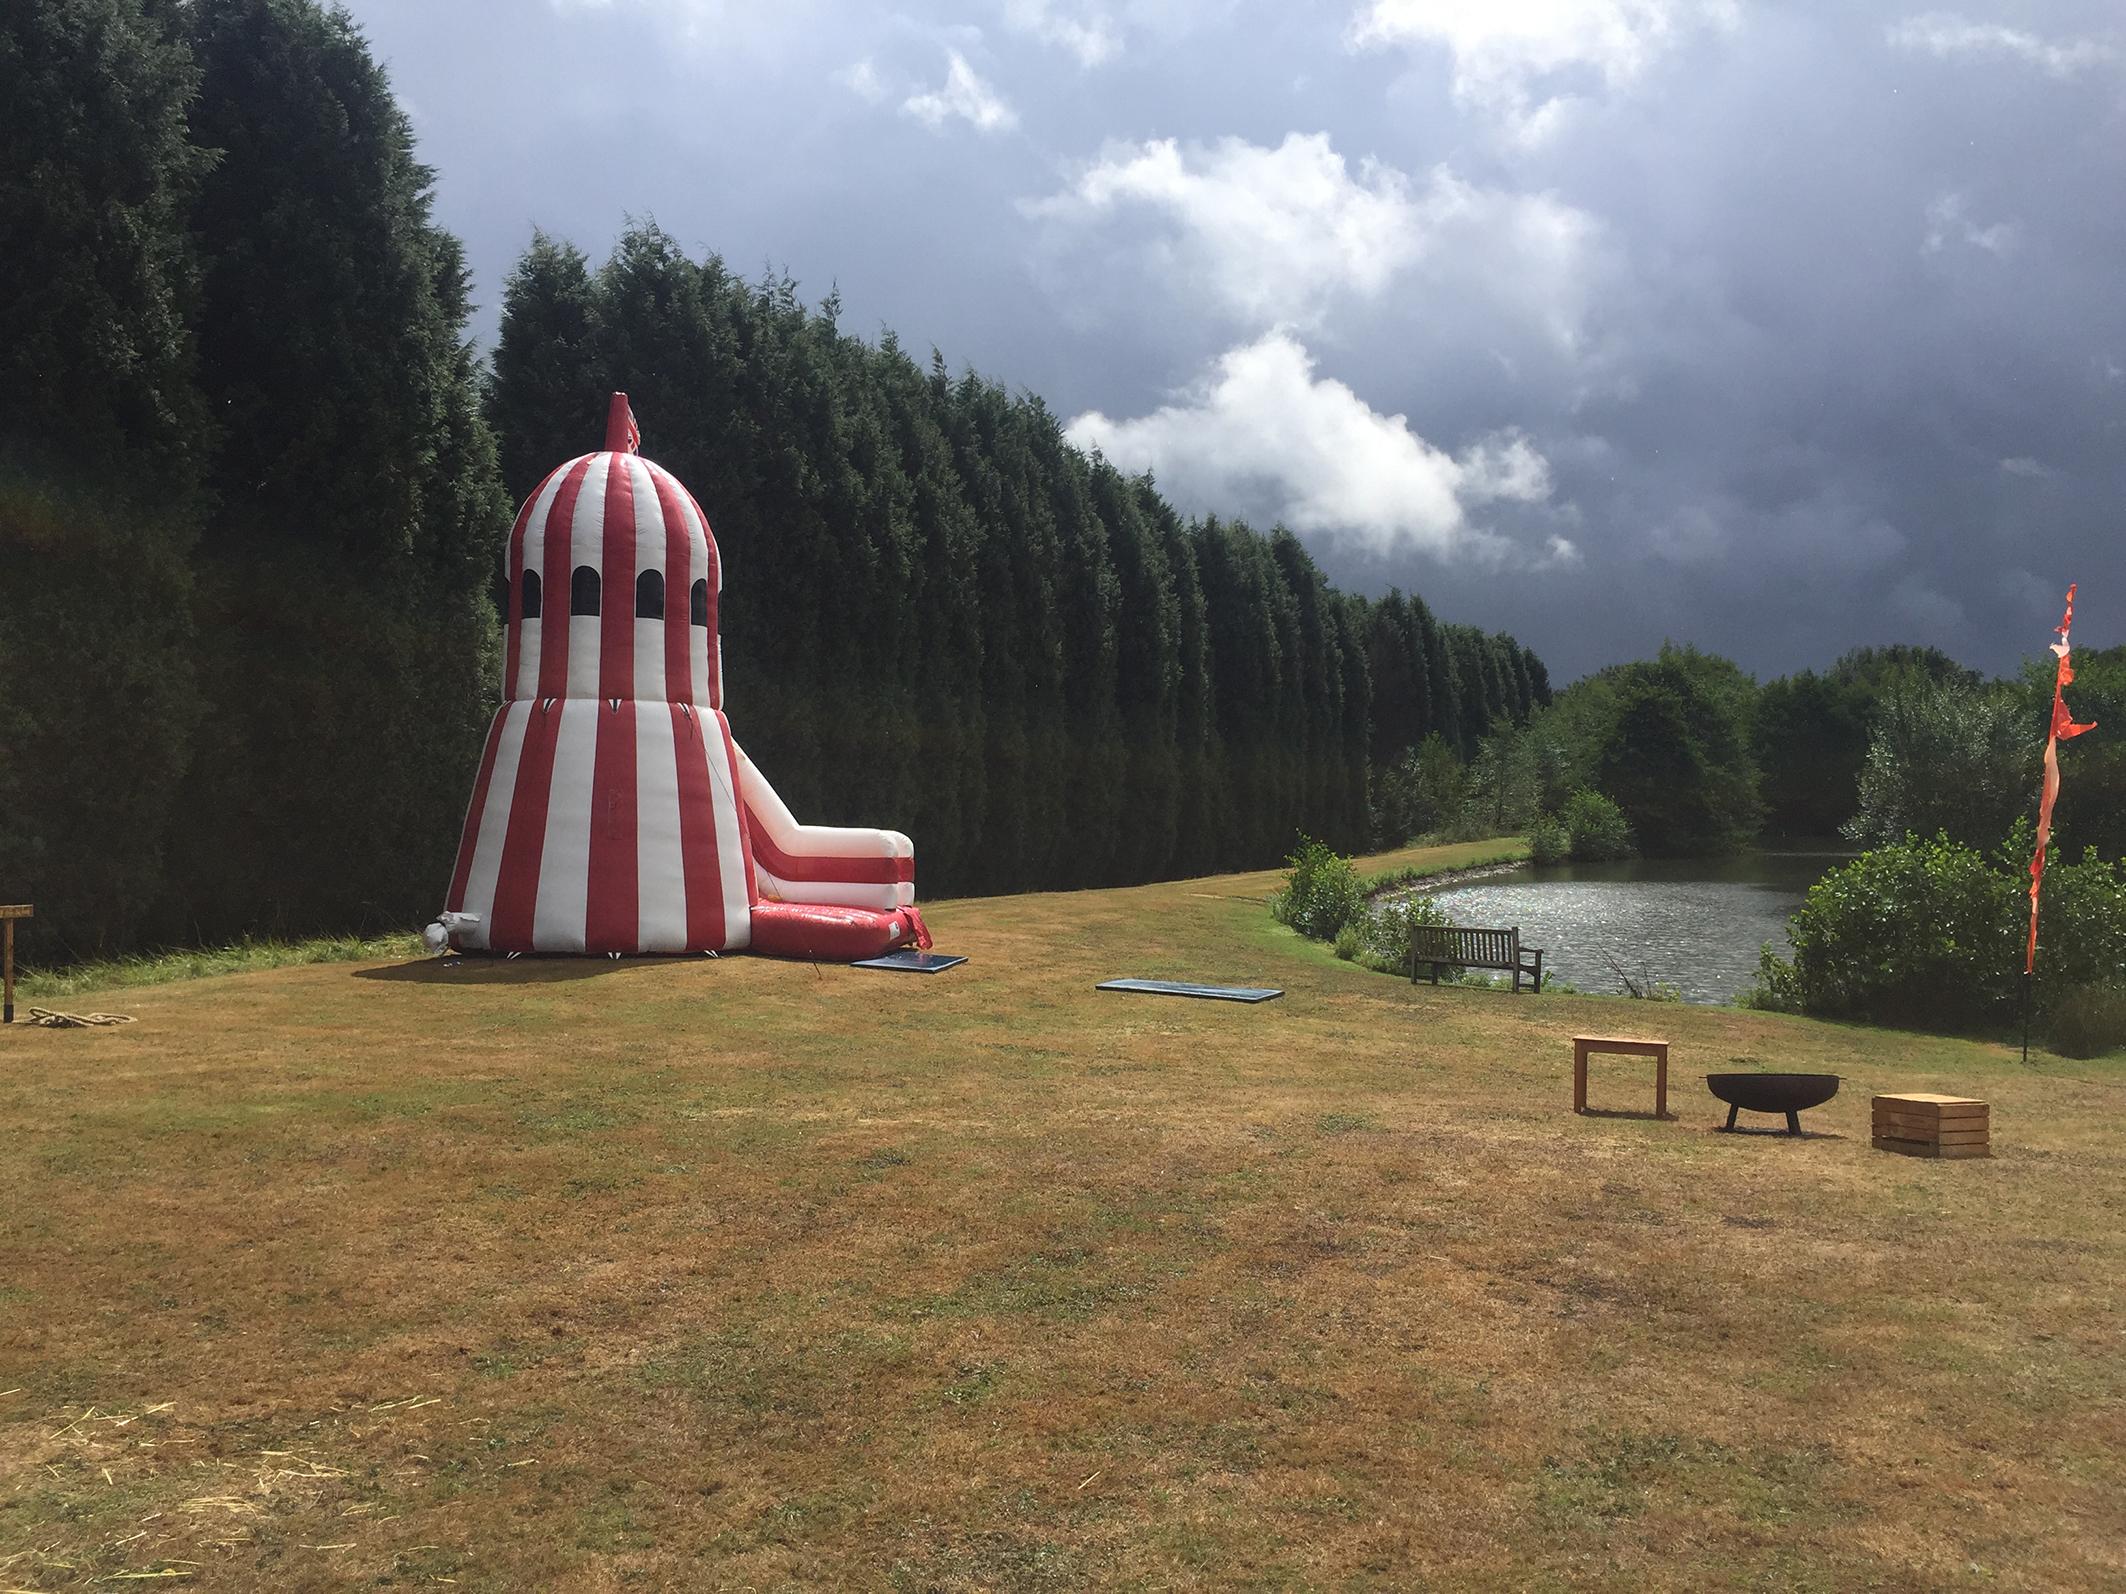 Fiesta-Fields-summer-party-helter-skelter.jpg